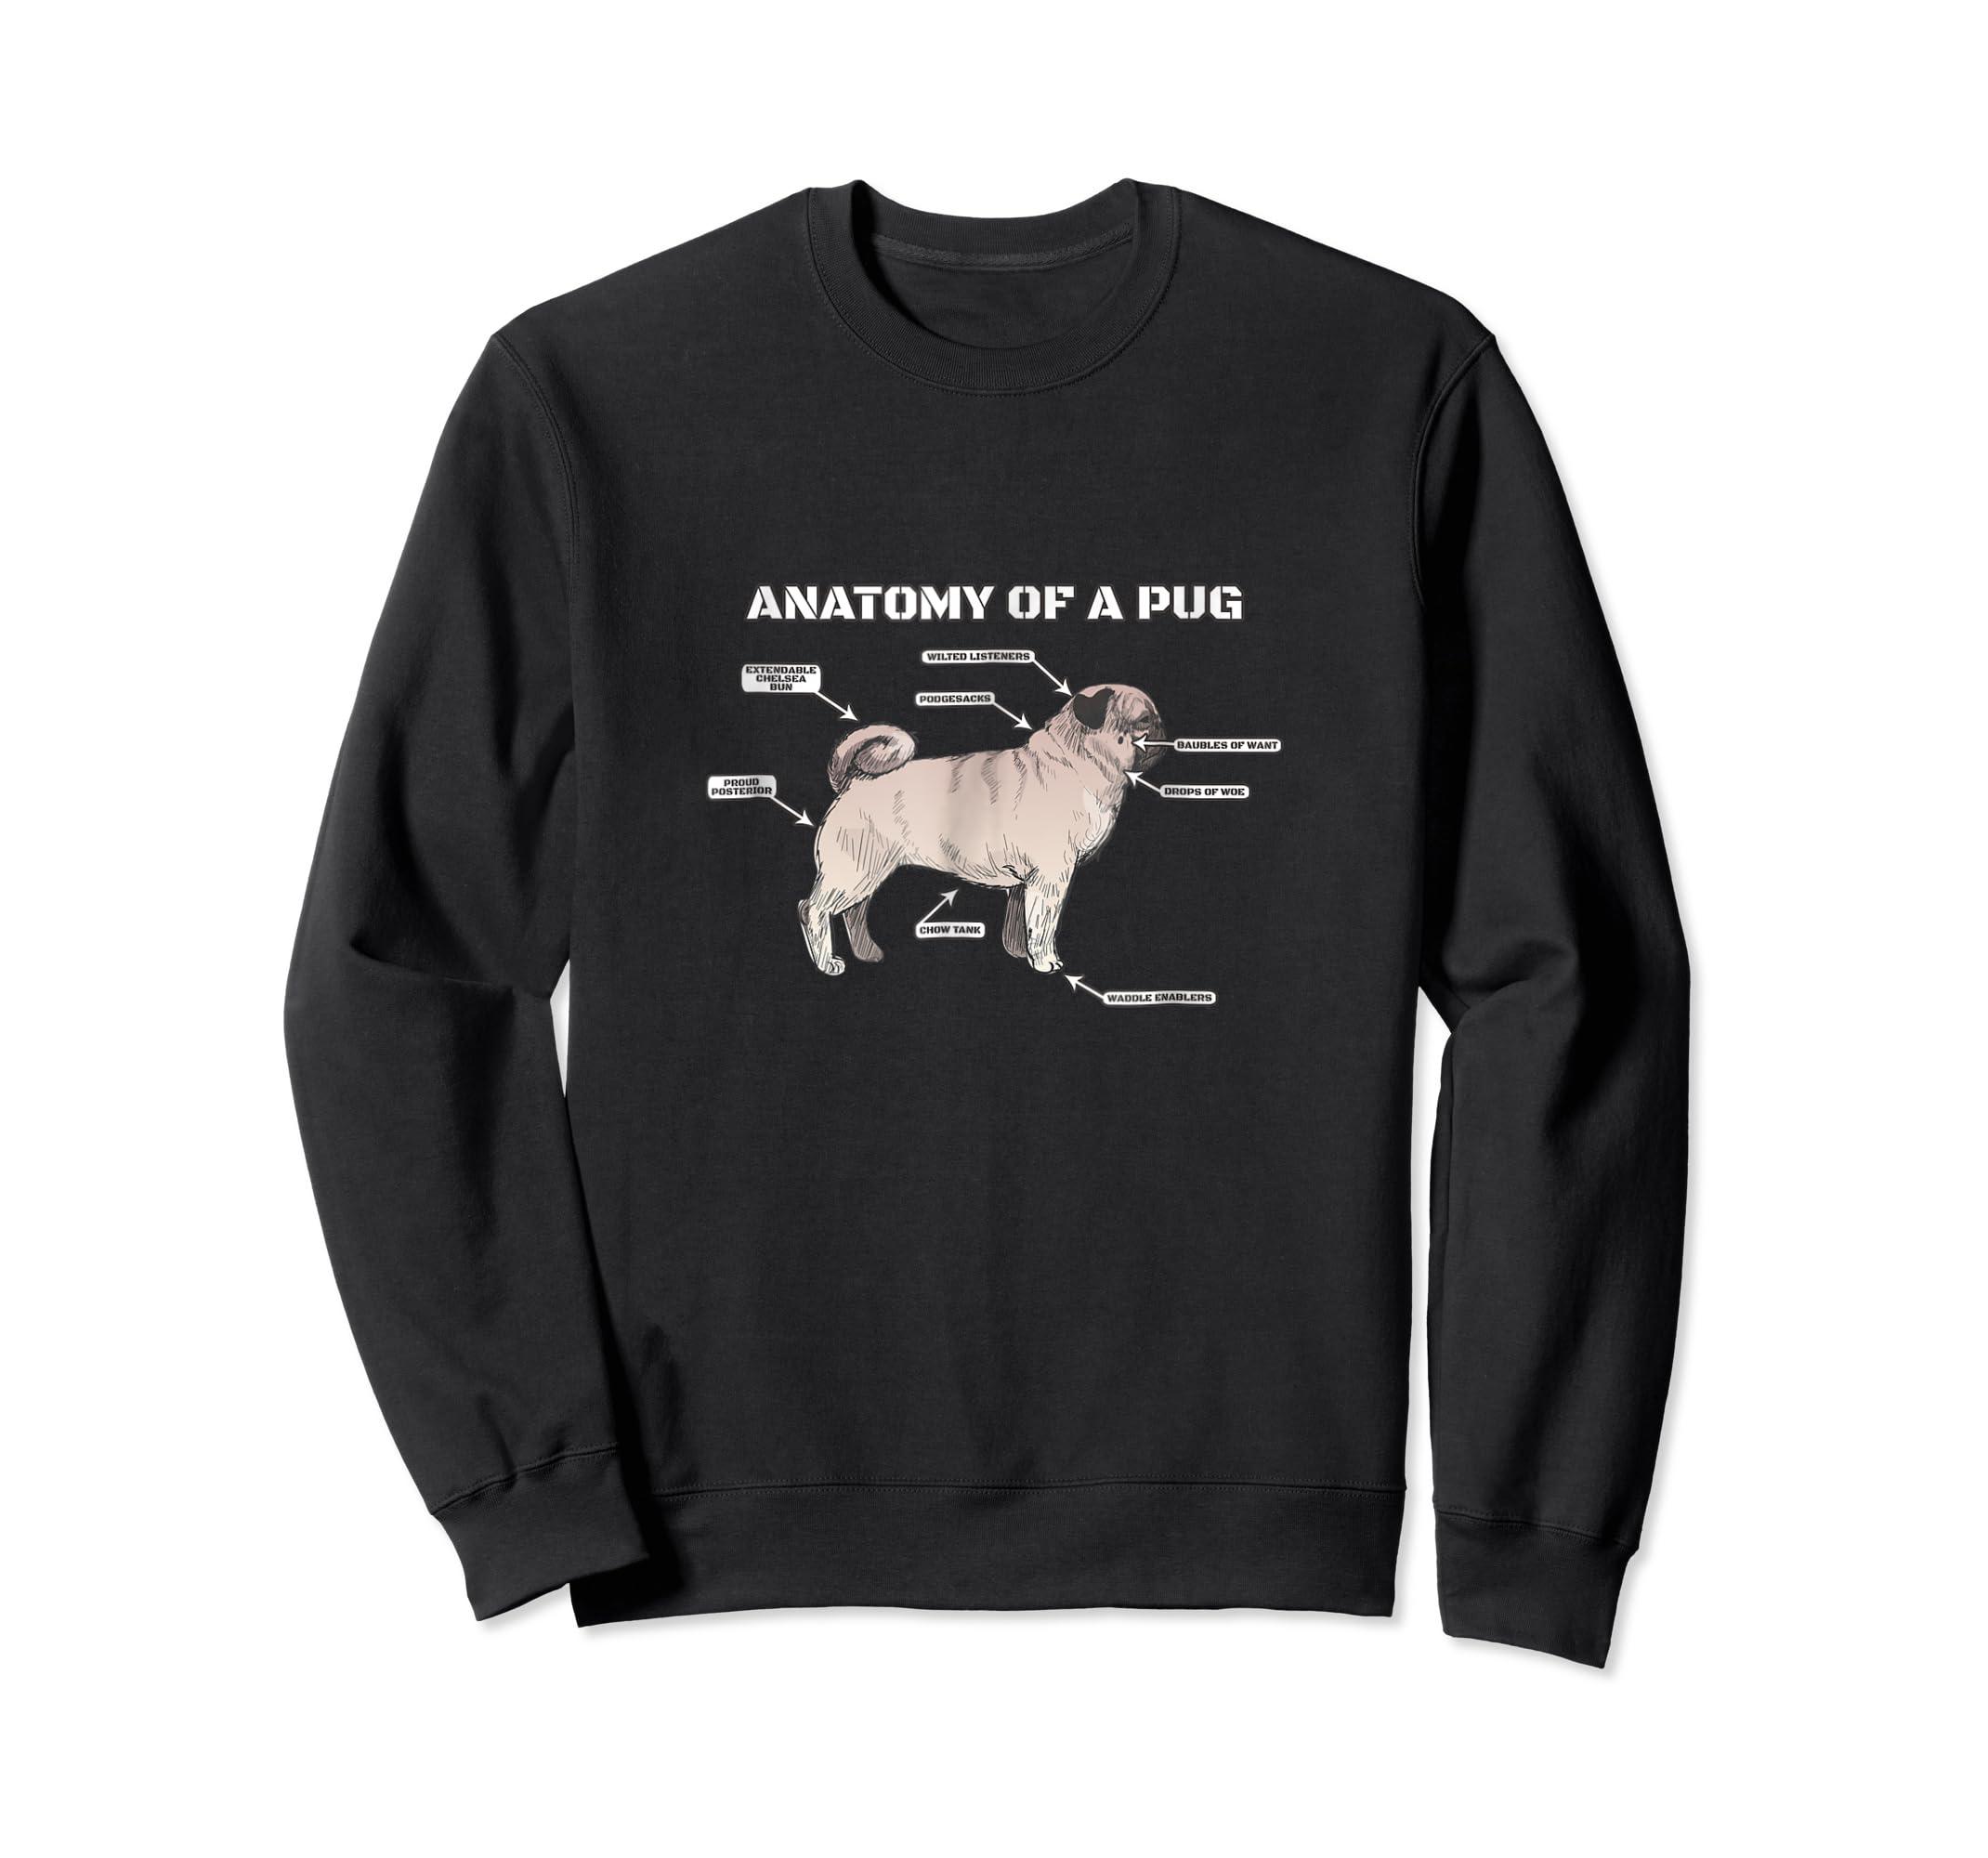 Cute Pug Anatomy T-Shirt - Funny Dog Puppy Tee-Sweatshirt-Black